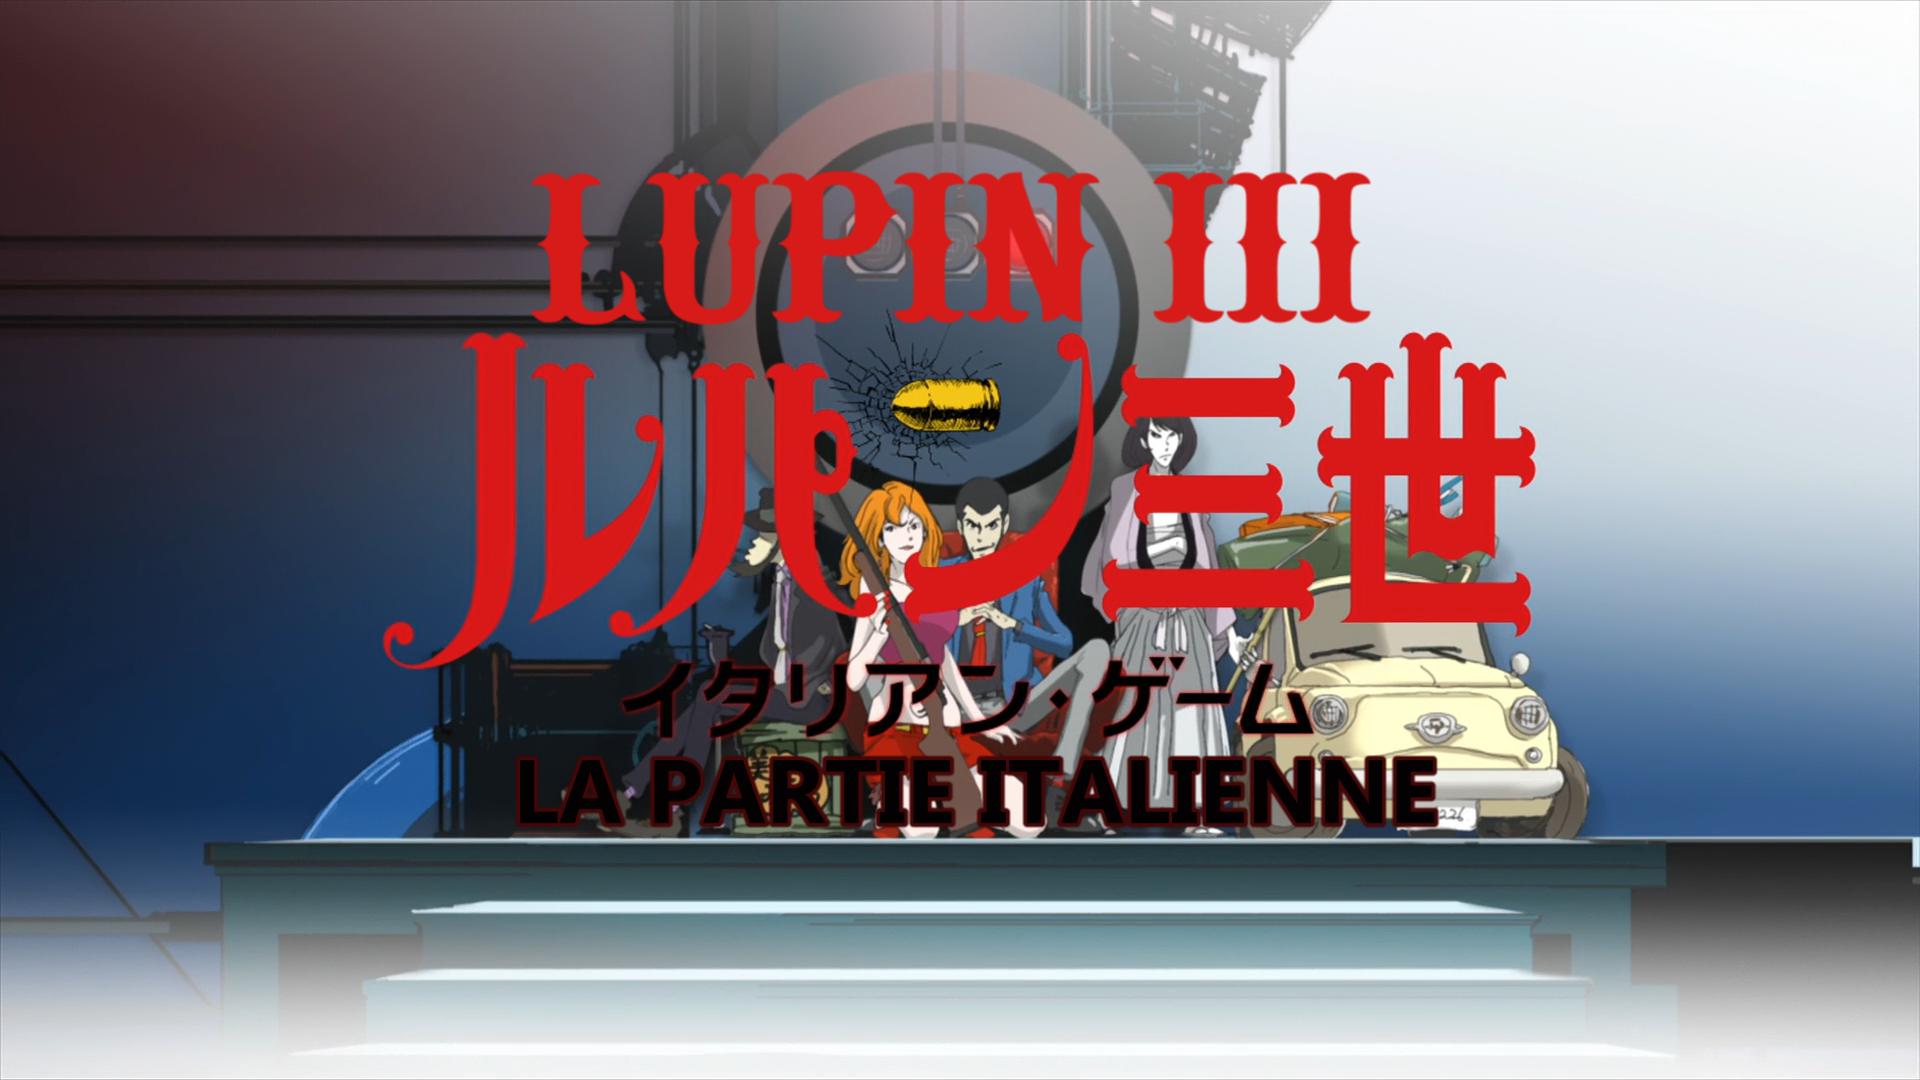 Lupin III TV-Special 25 (2016) La partie italienne - Italian Game VOSTFR